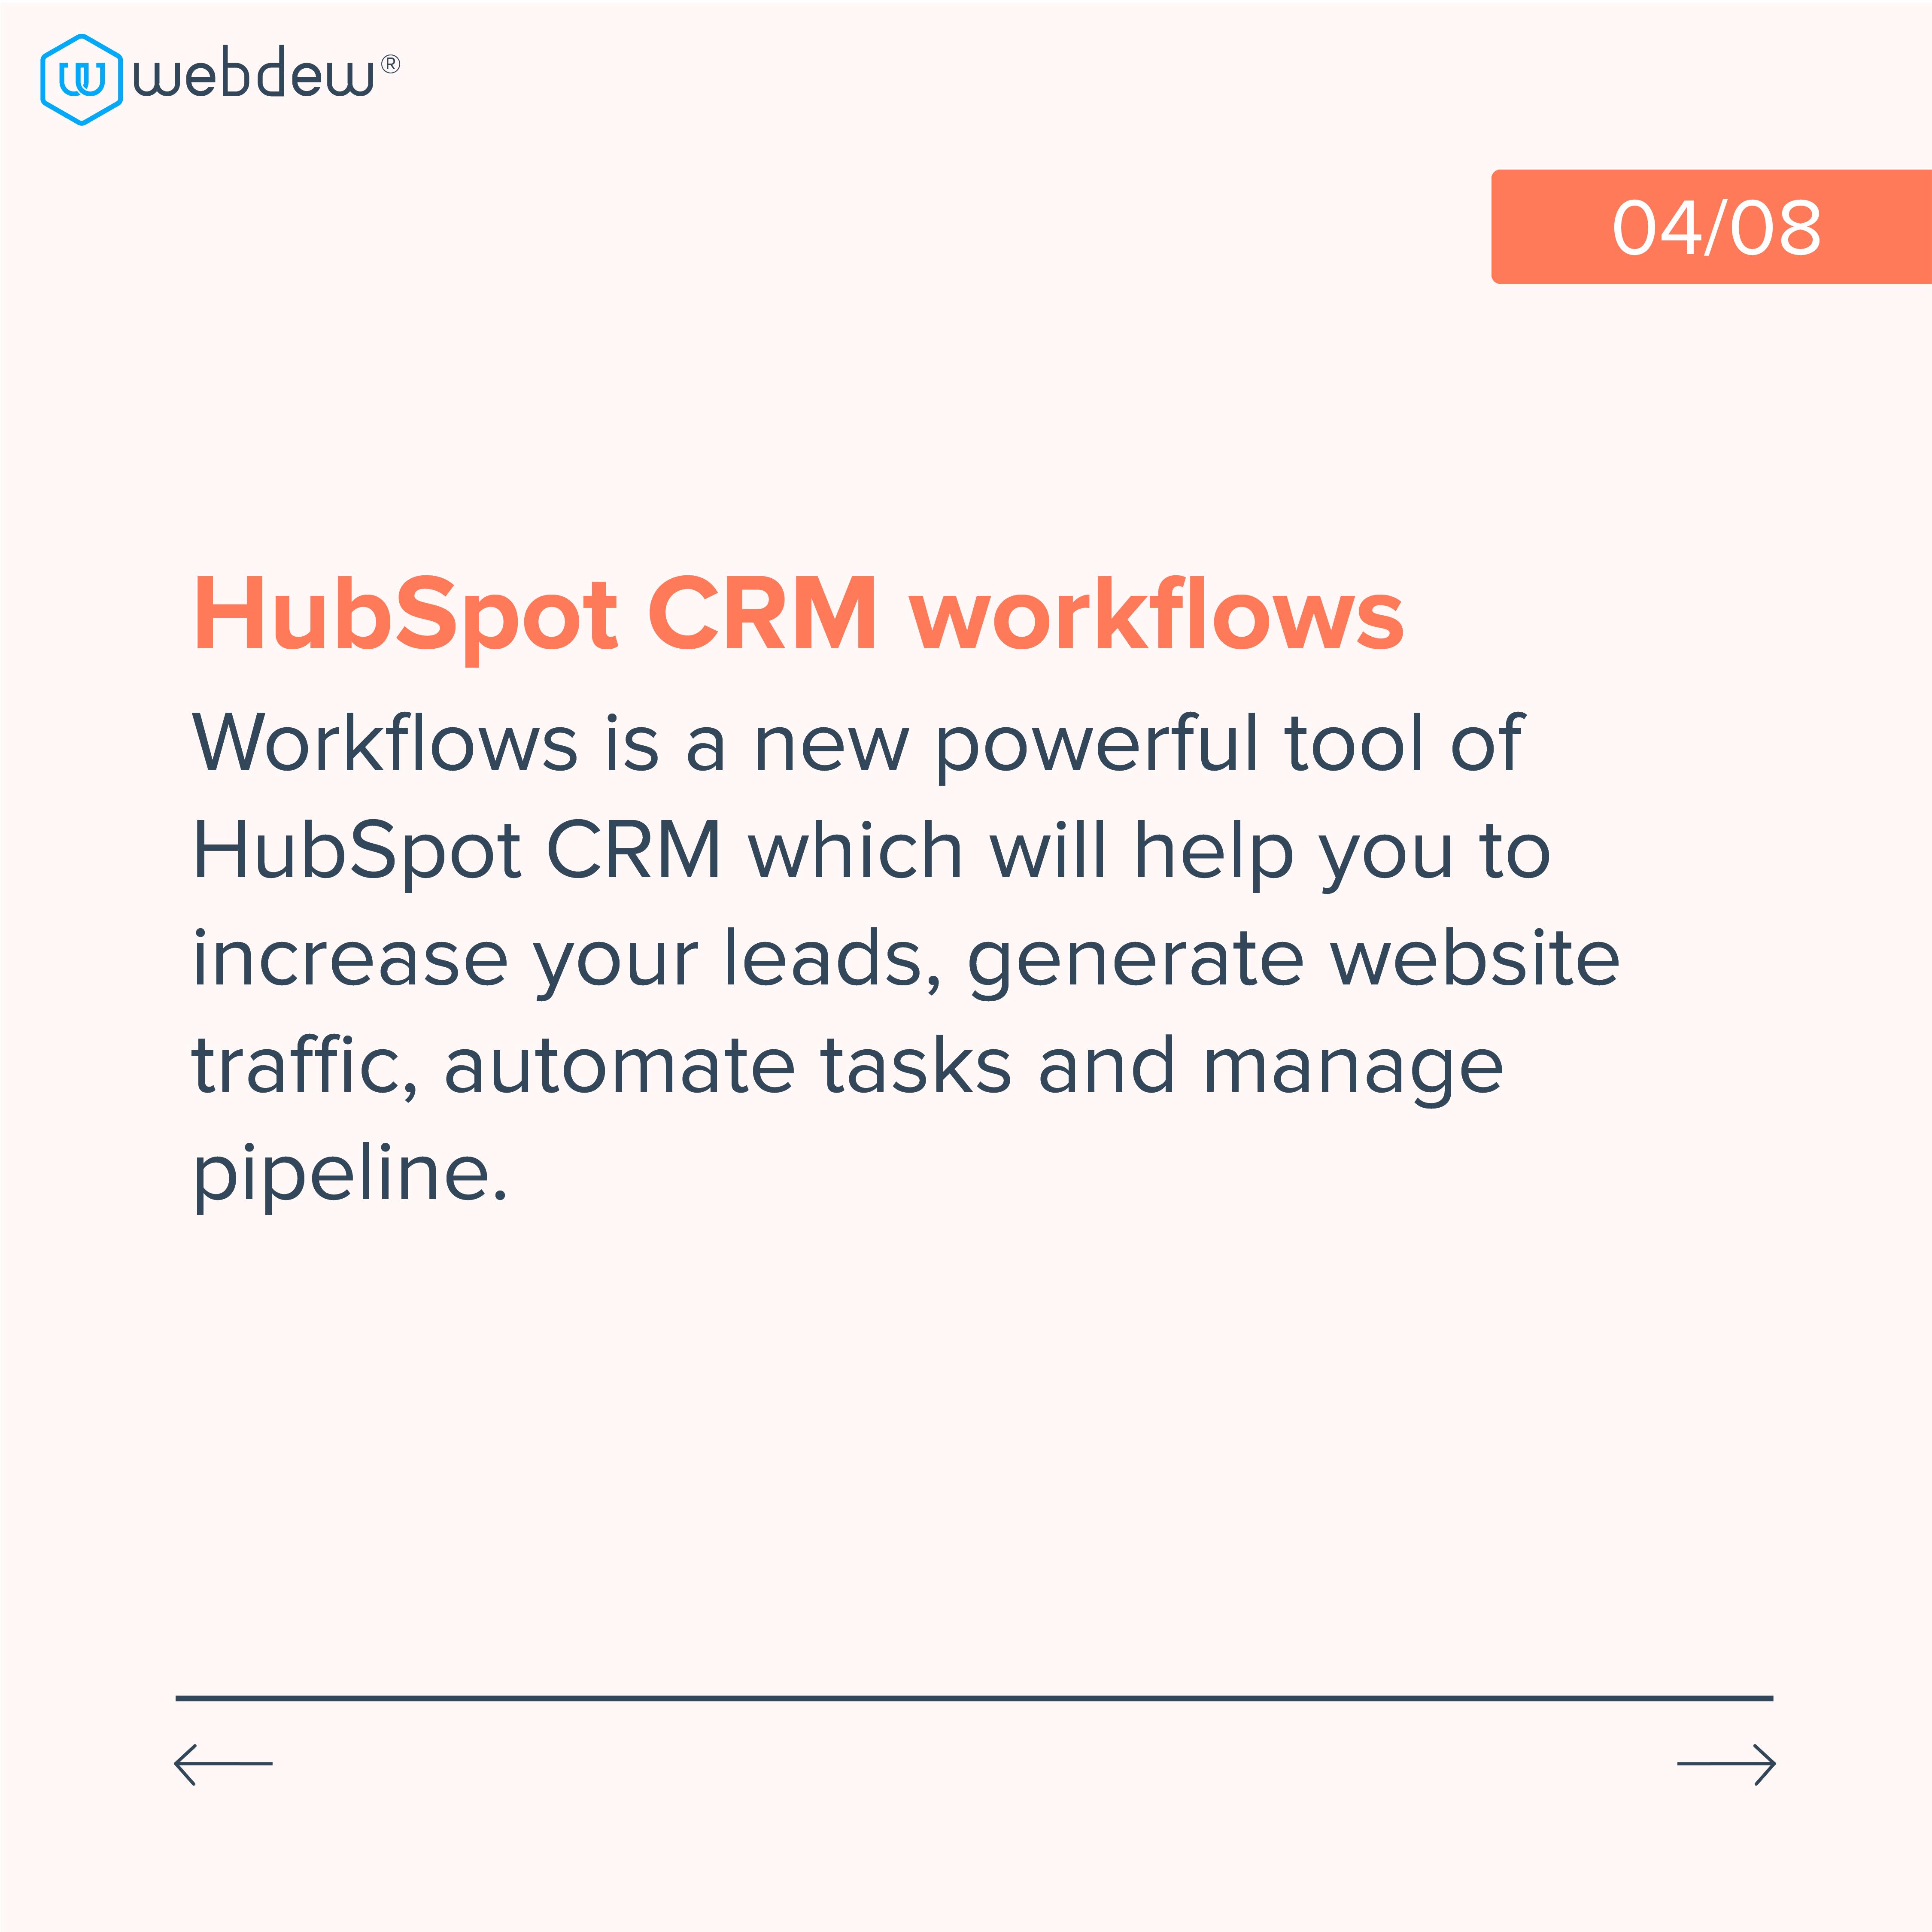 4. hubspot CRM workflow